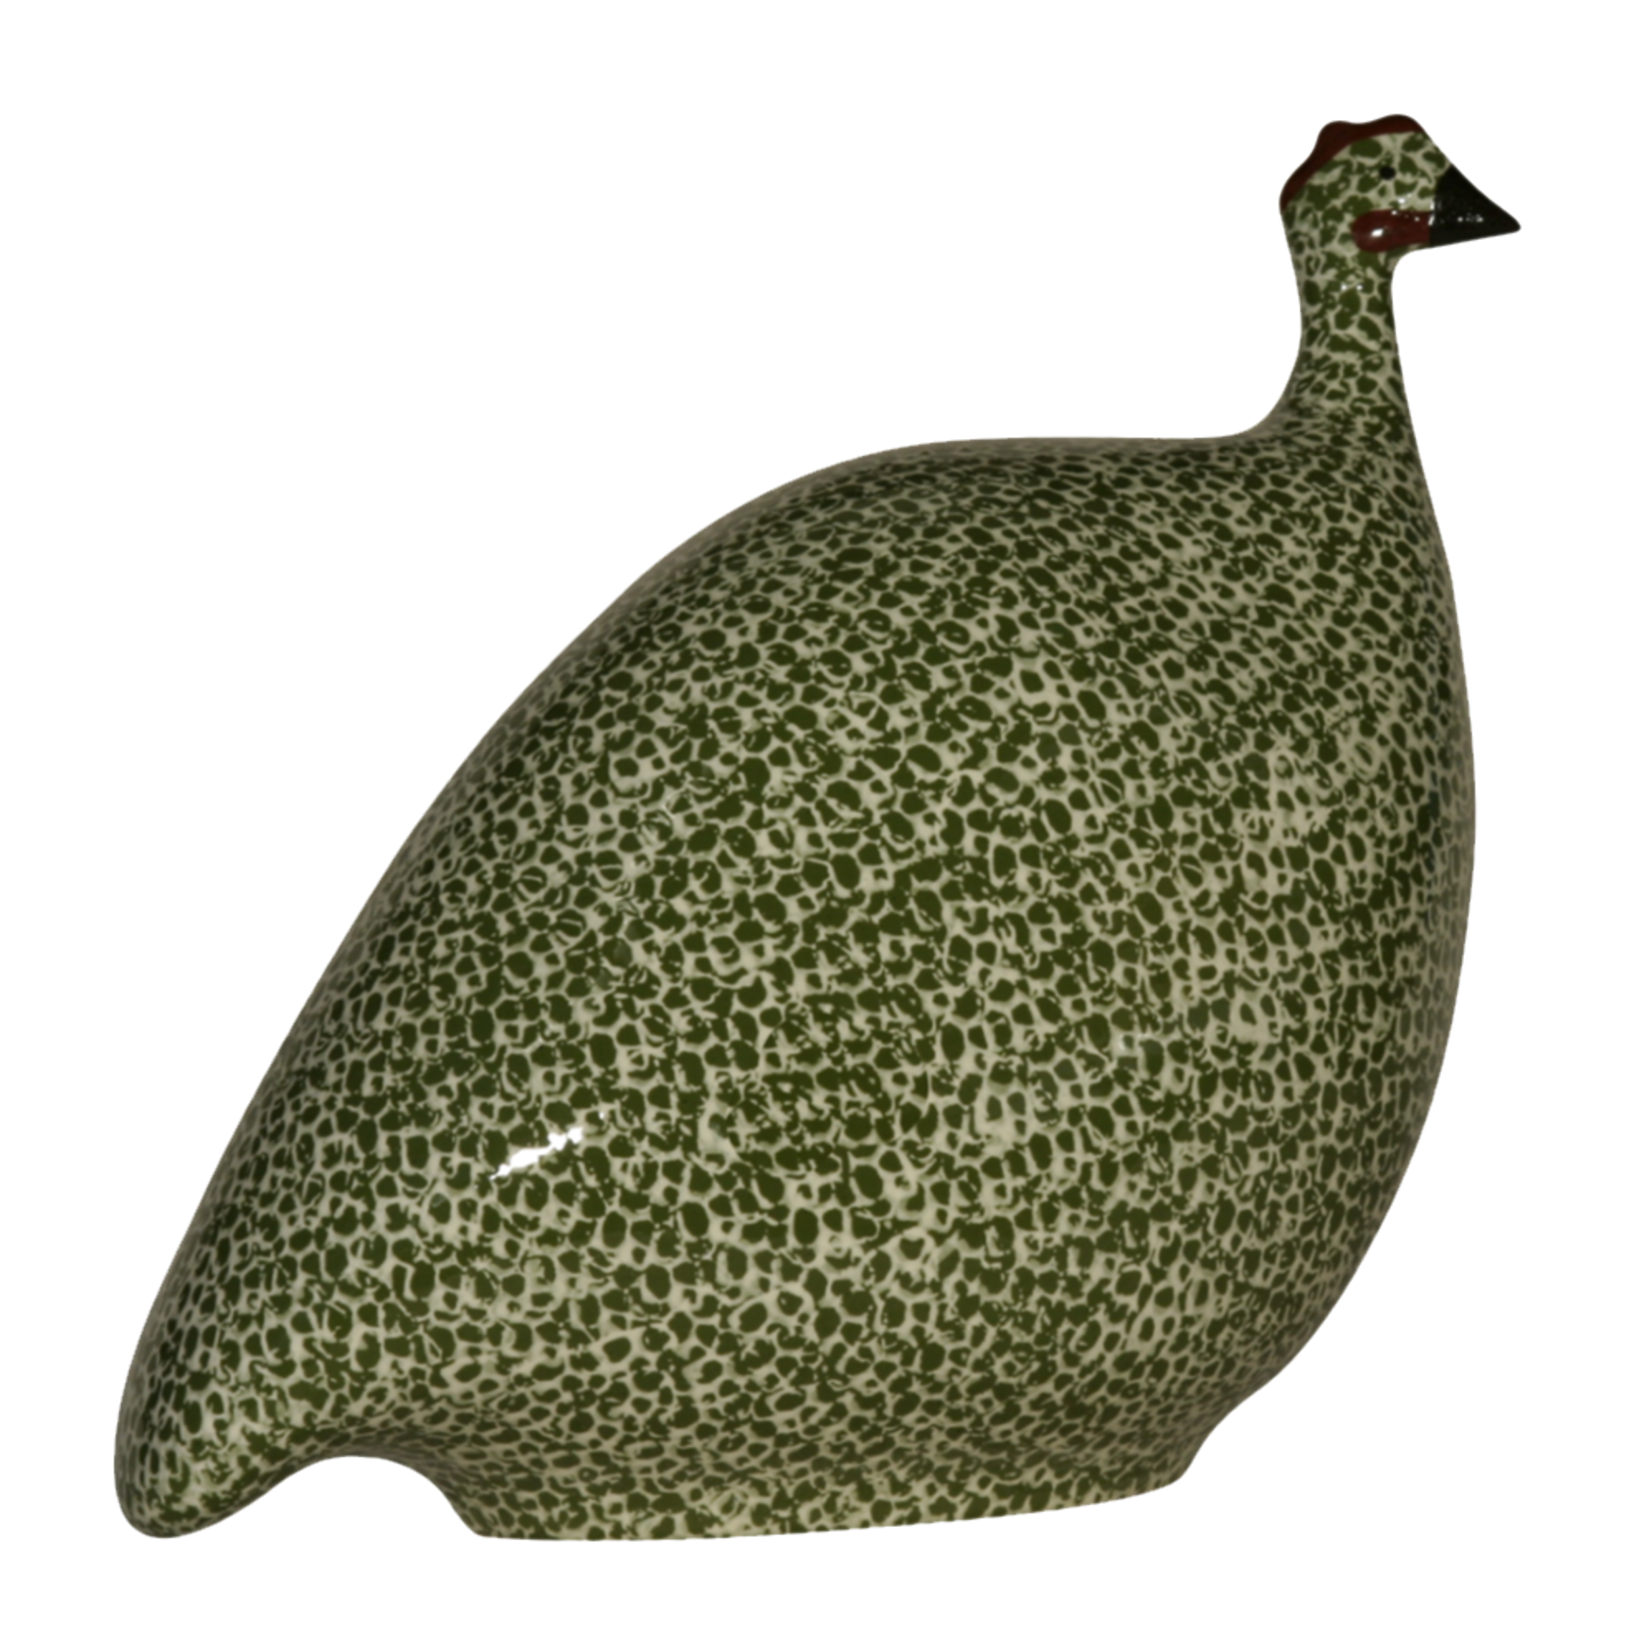 Light Green Speckled Frog Green French Guinea Hen